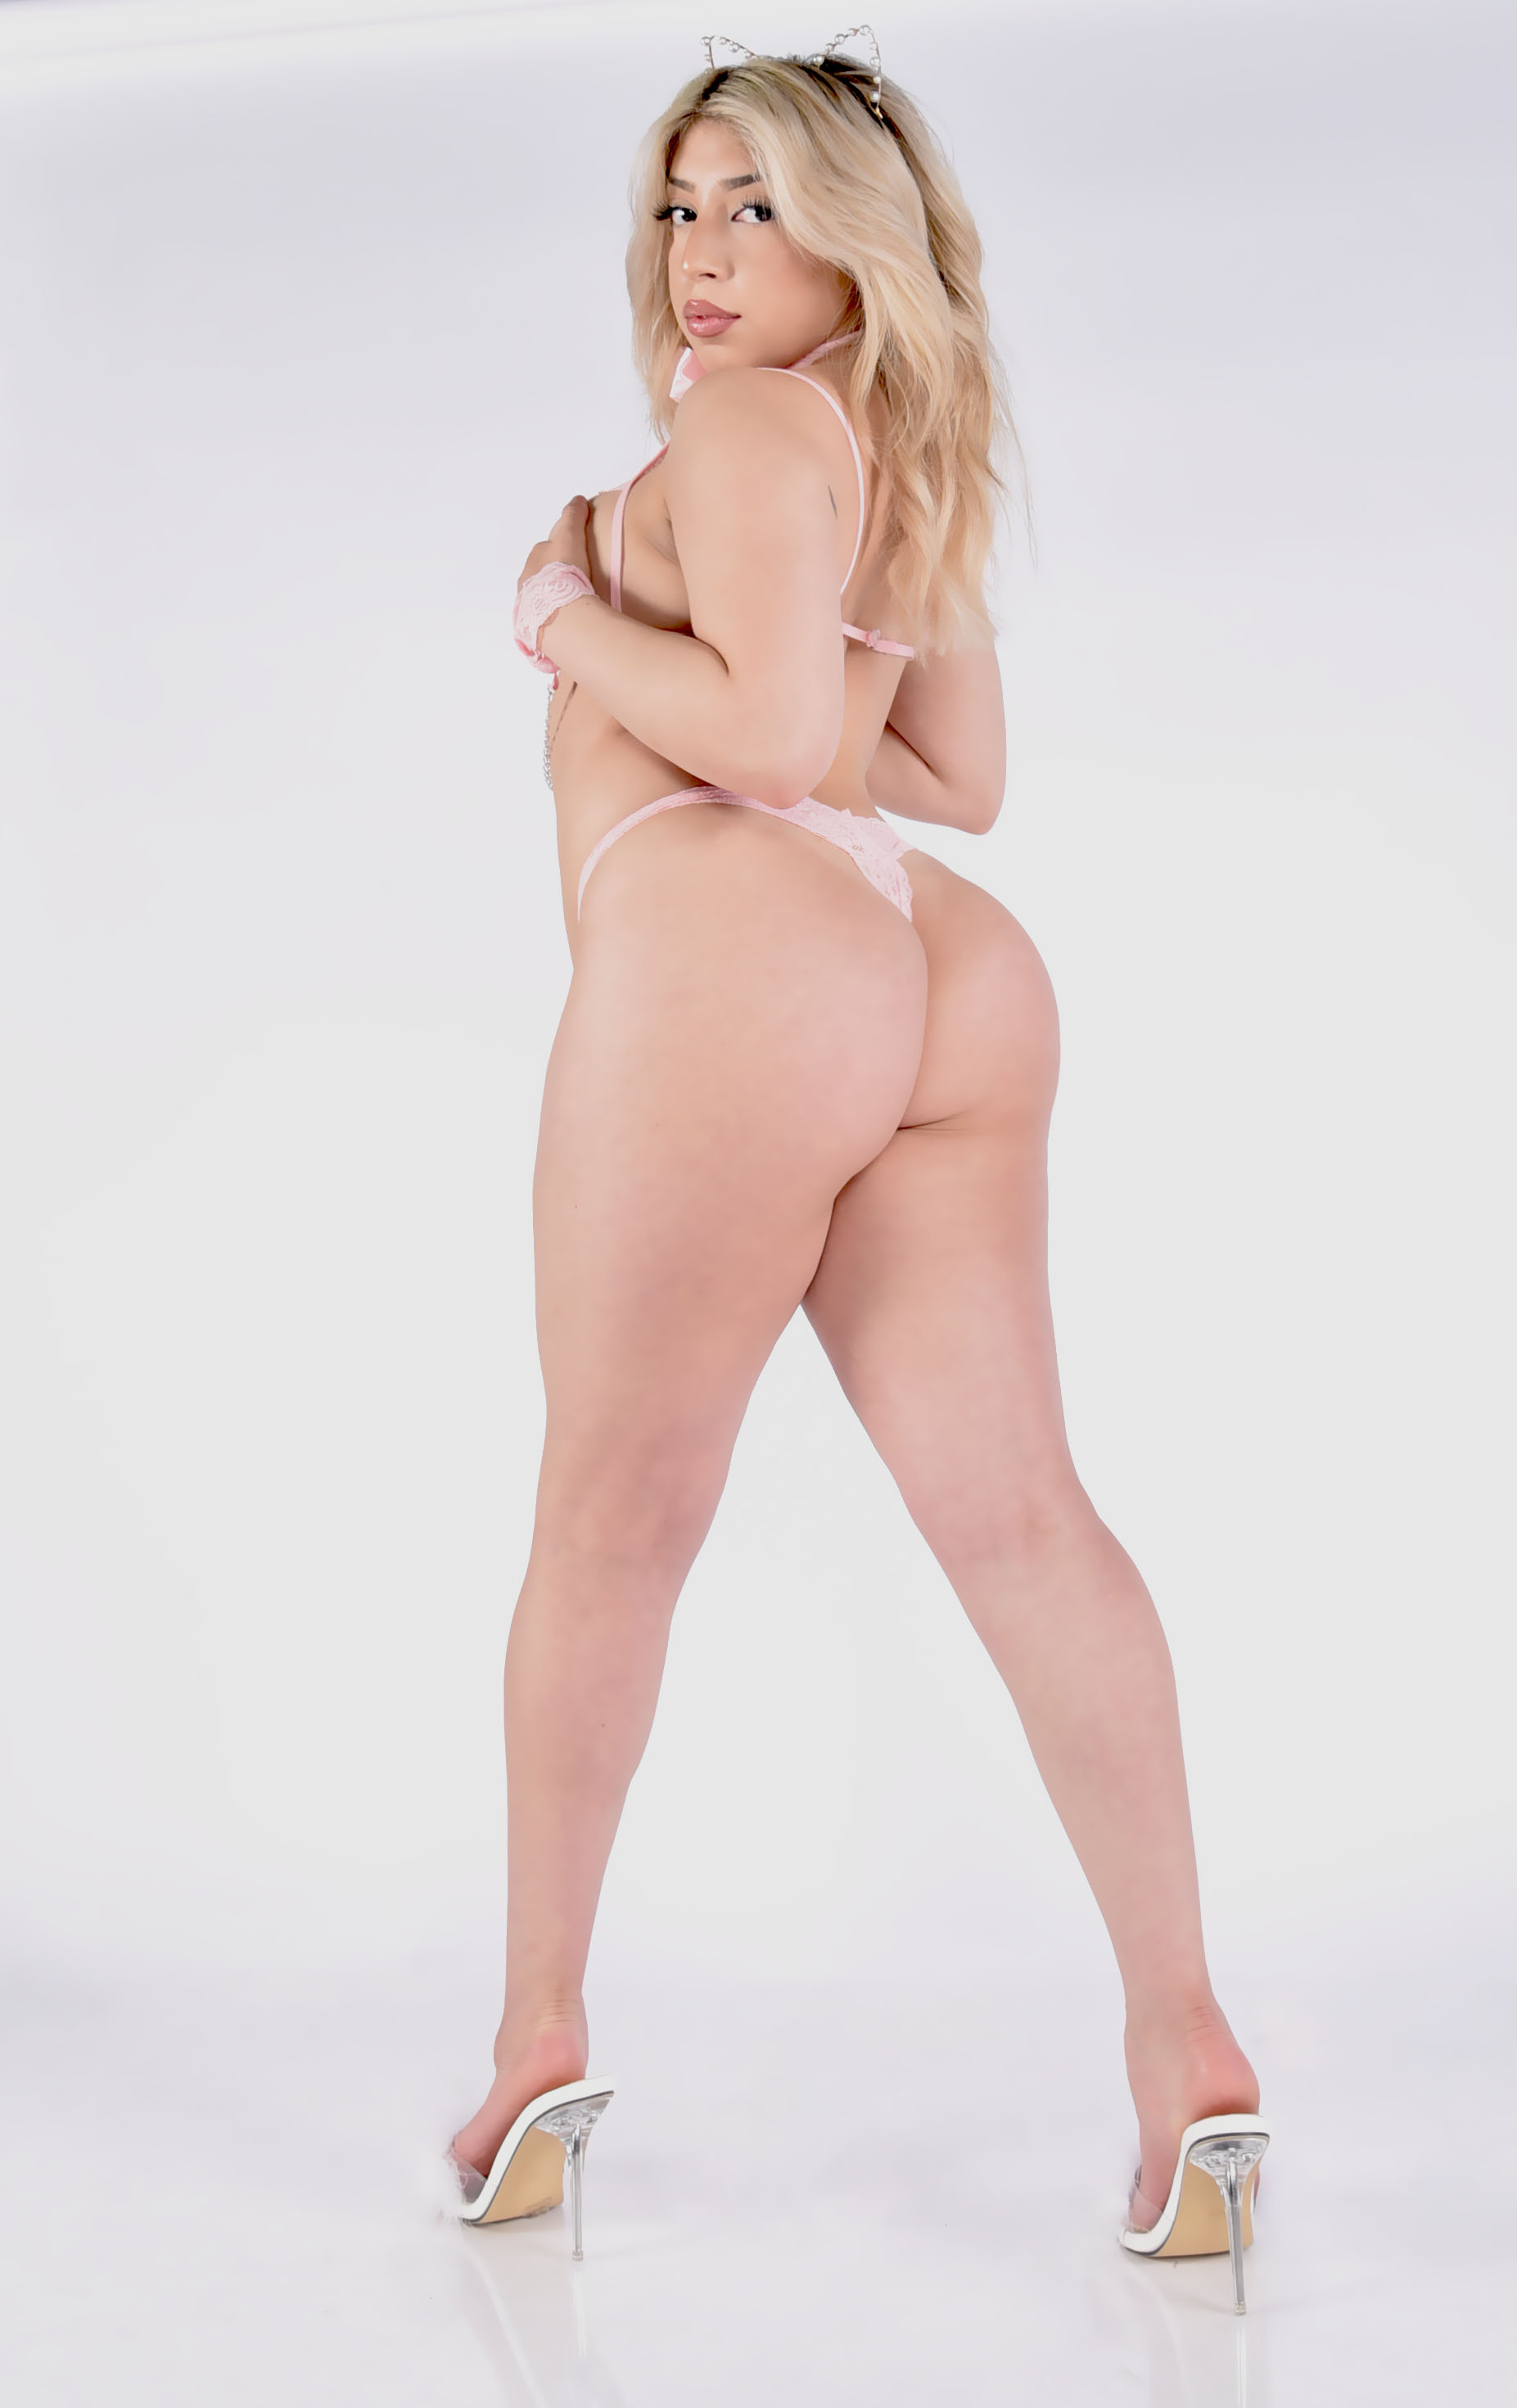 Cassie Bachelor party stripper